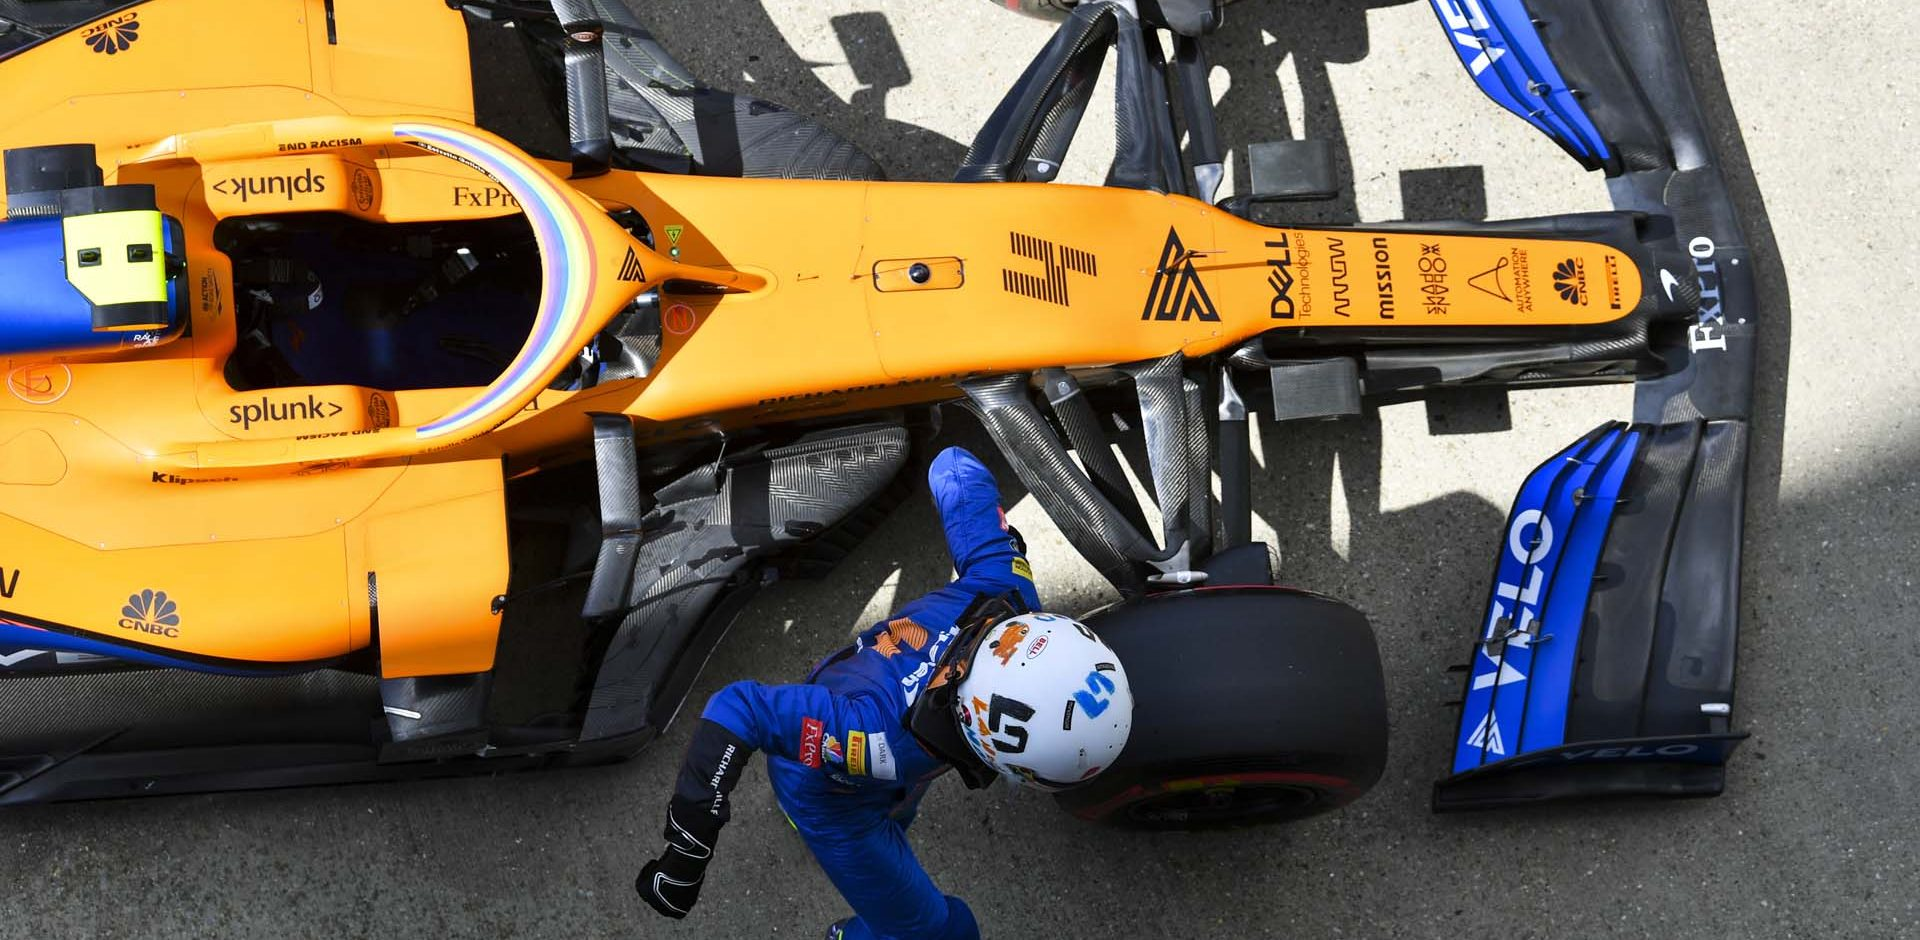 Lando Norris, McLaren MCL35, arrives in Parc Ferme after Qualifying